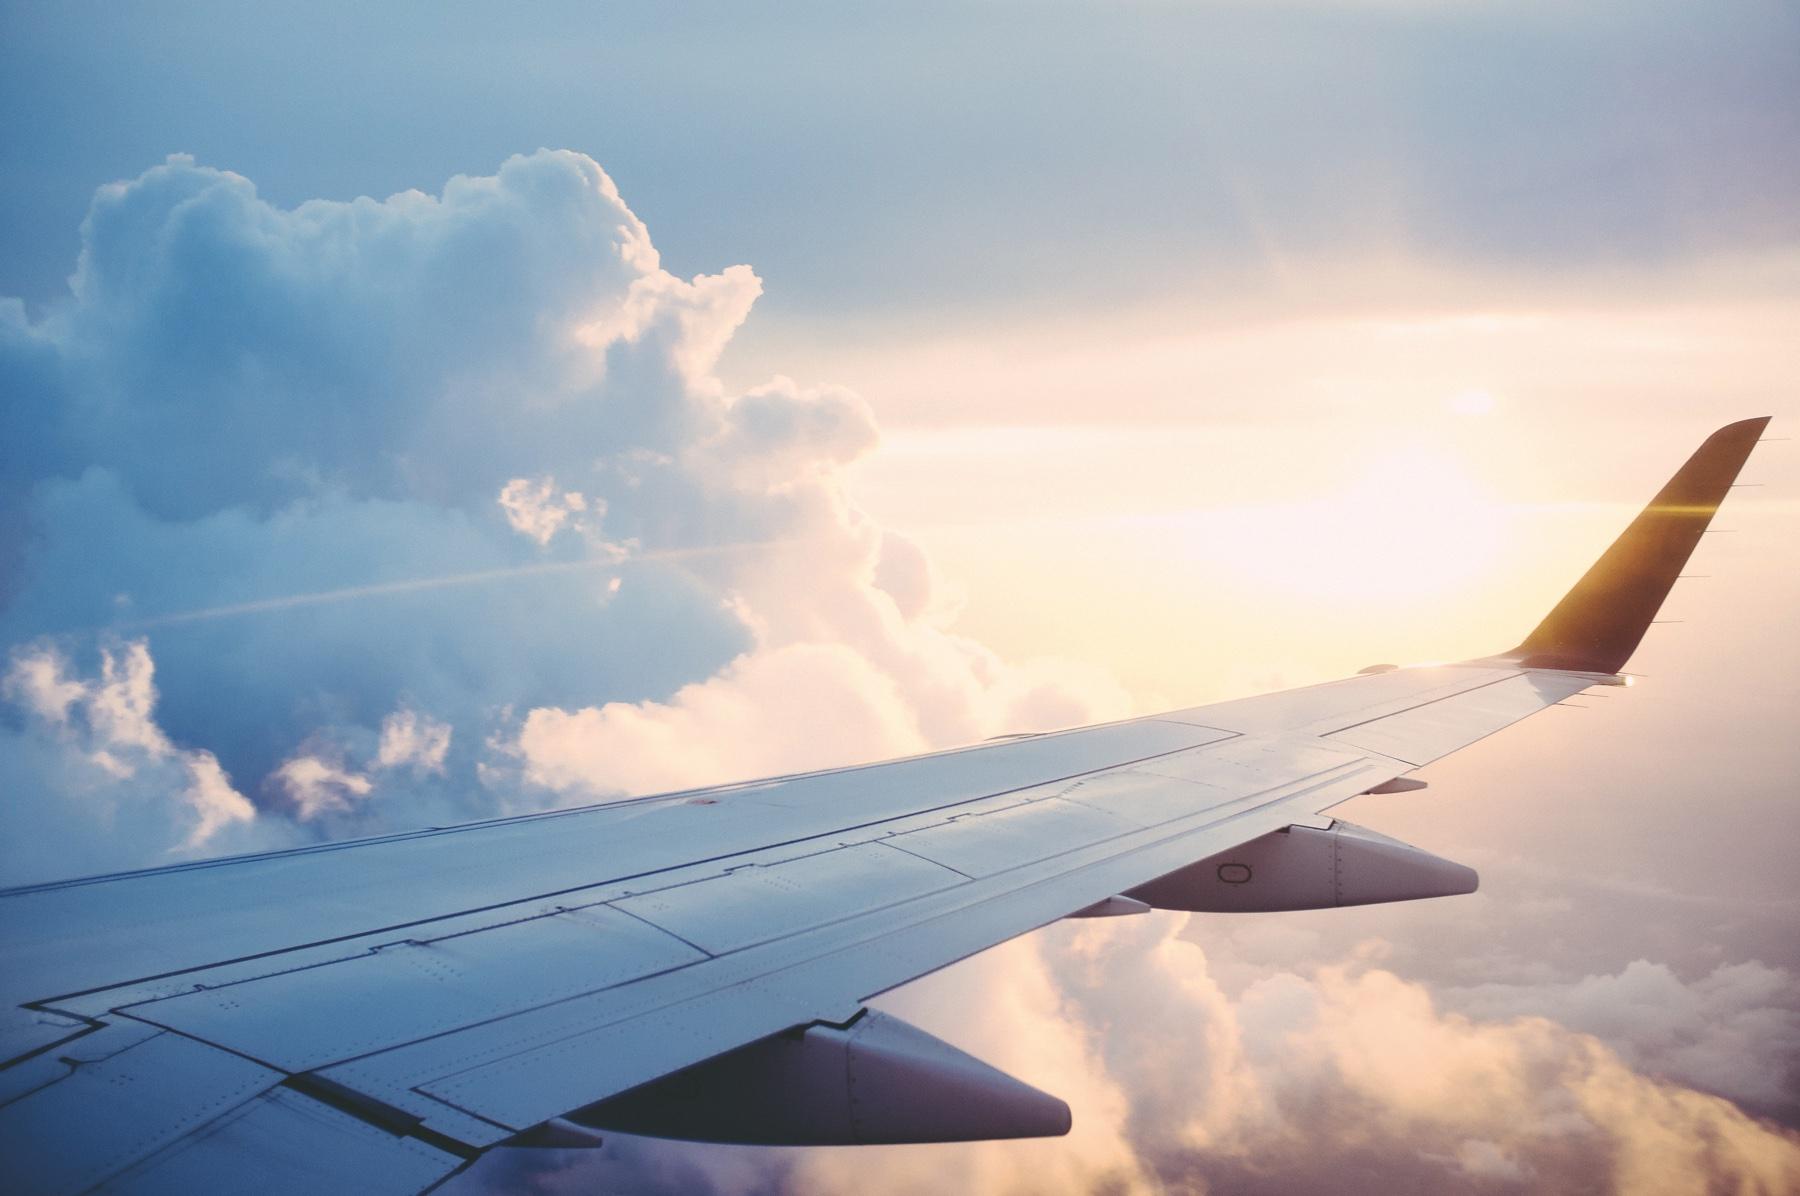 FF201910-plane-841441